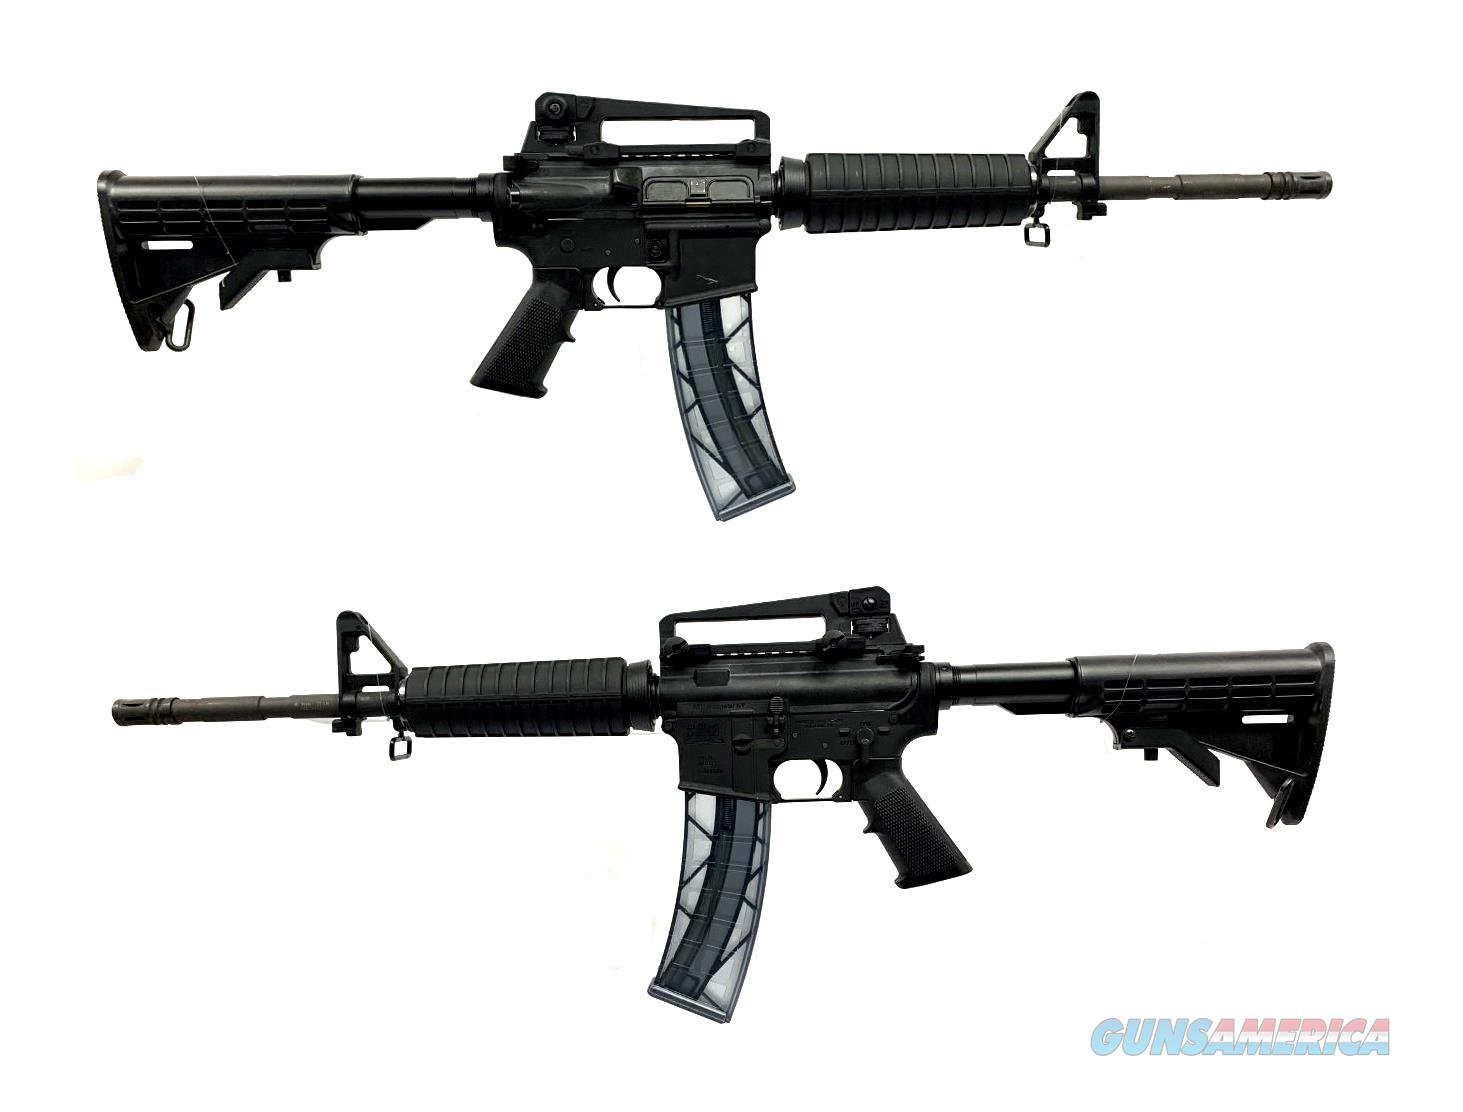 PSA PA-15 ATI .22LR Semi-Automatic Rifle  Guns > Rifles > American Tactical Imports Rifles